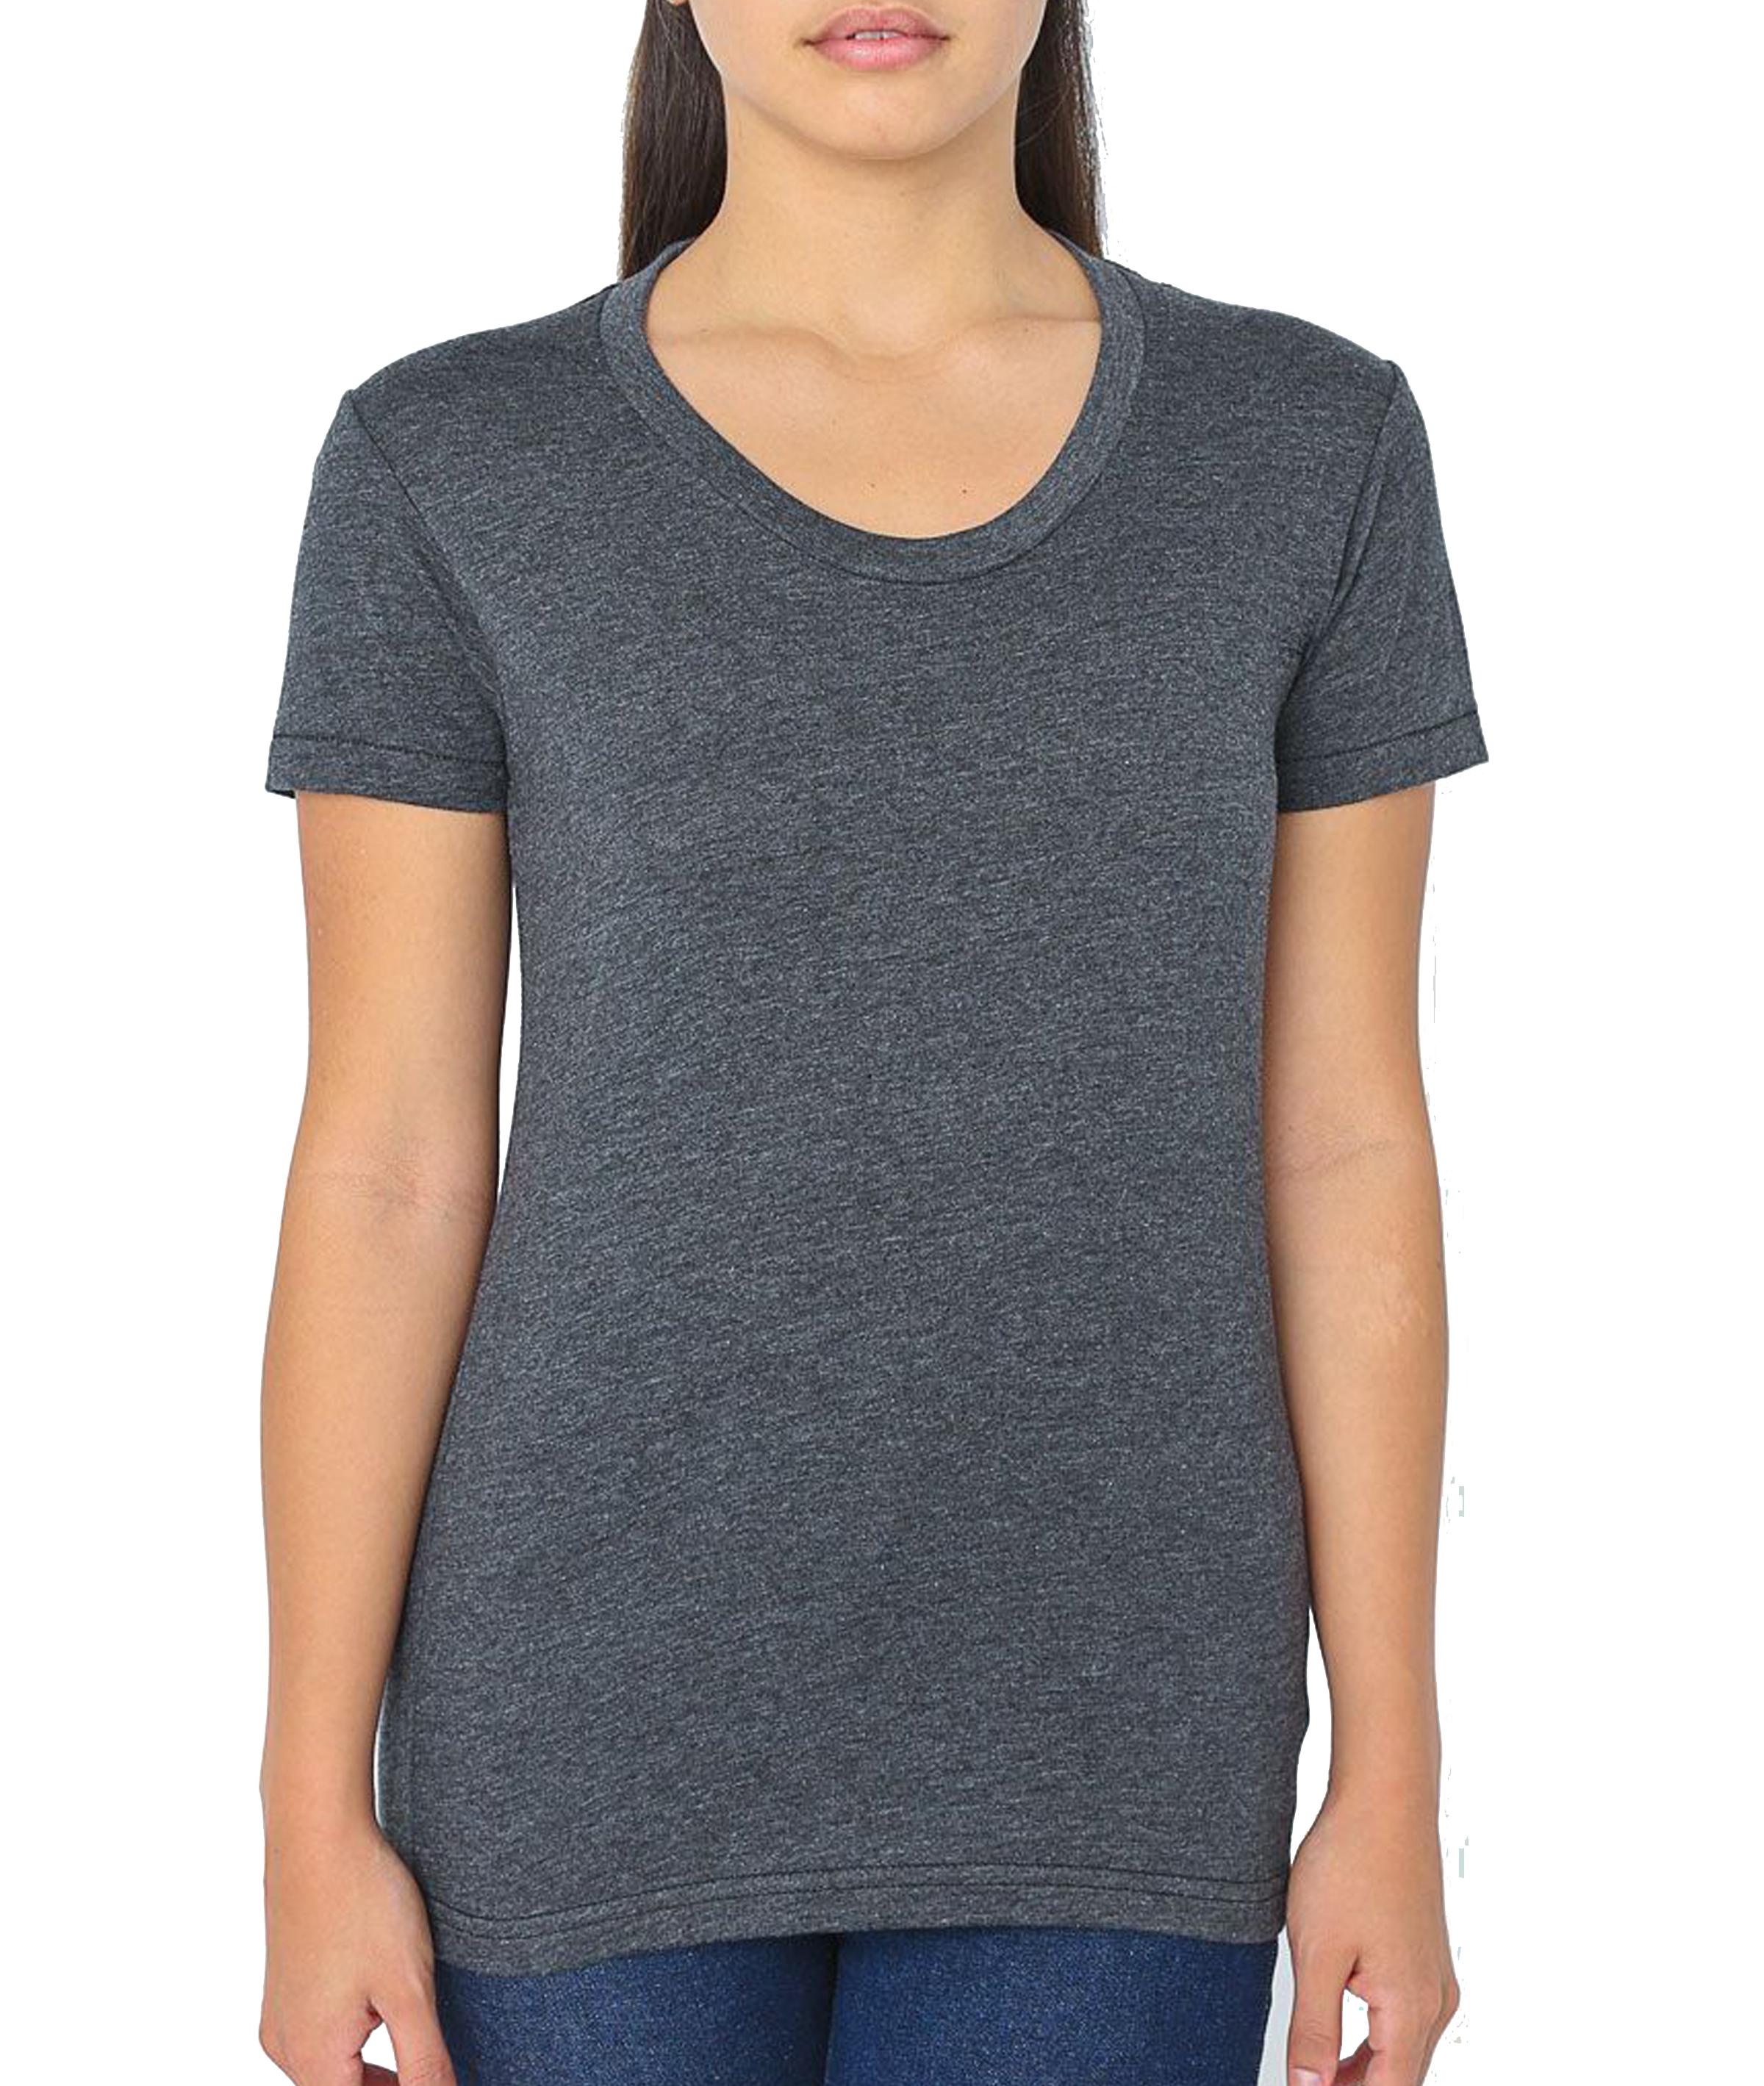 American Apparel Ladies' Cotton/Poly T-Shirt